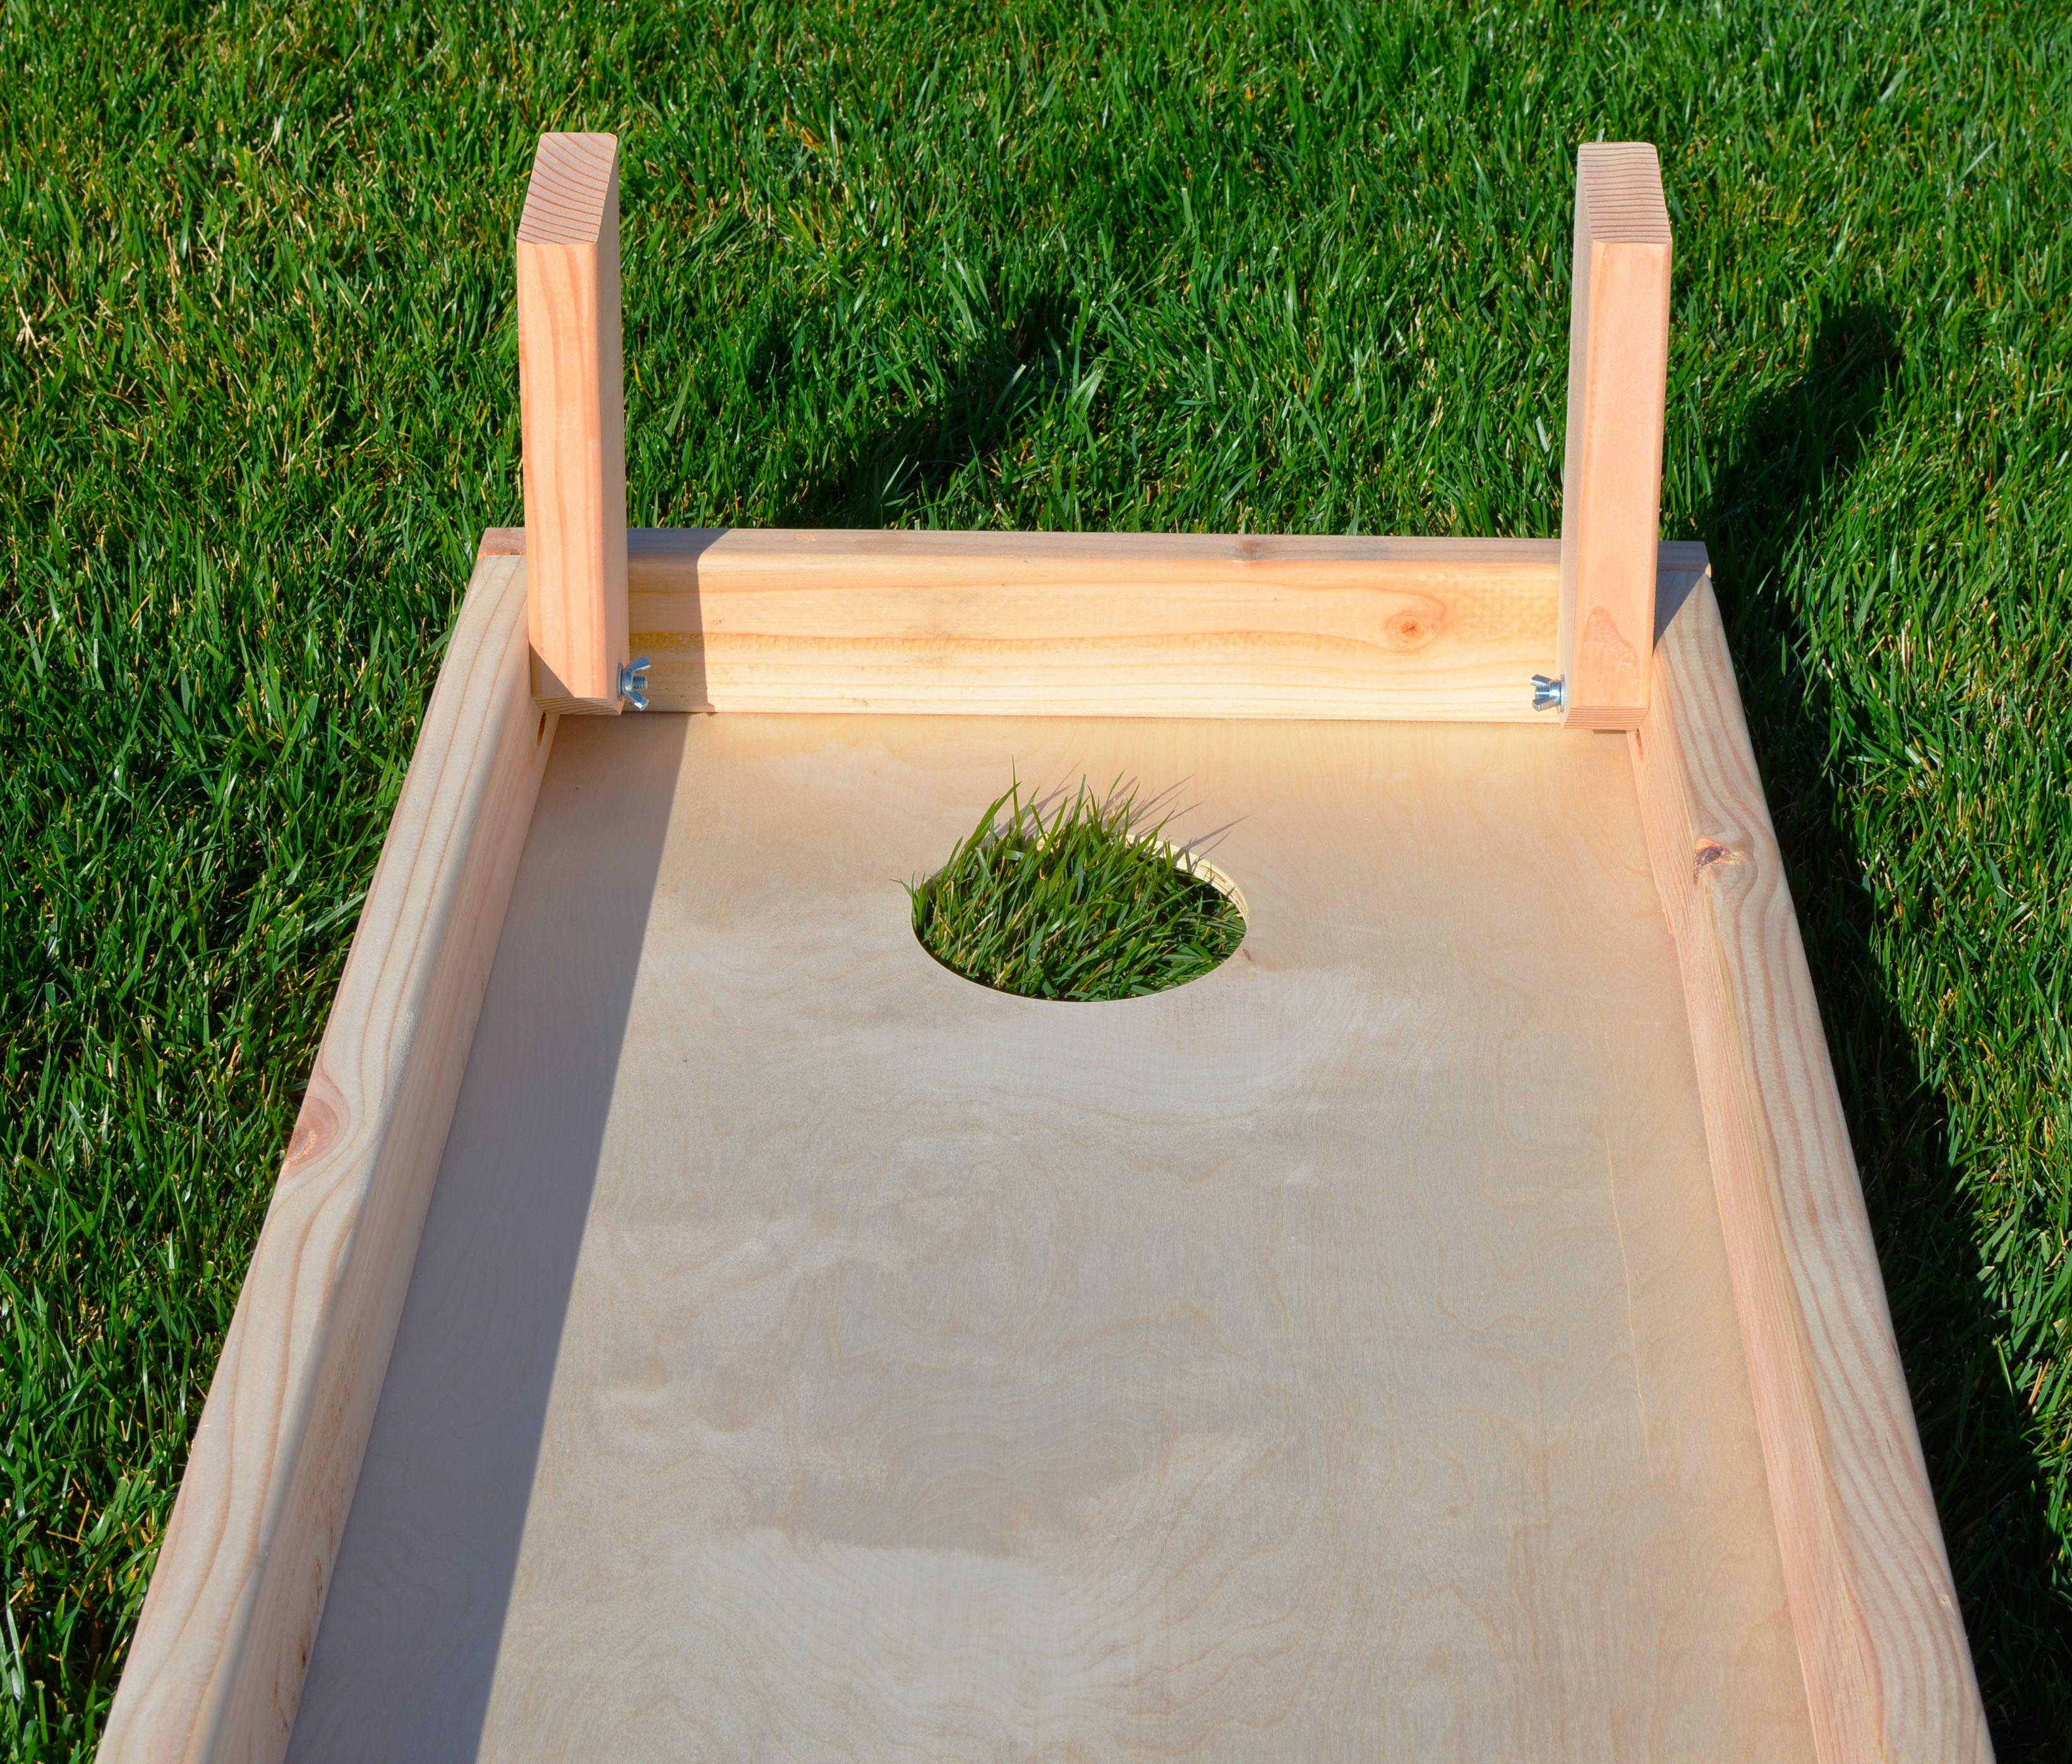 customcornhole-cornhole-boards-legs-top.jpg